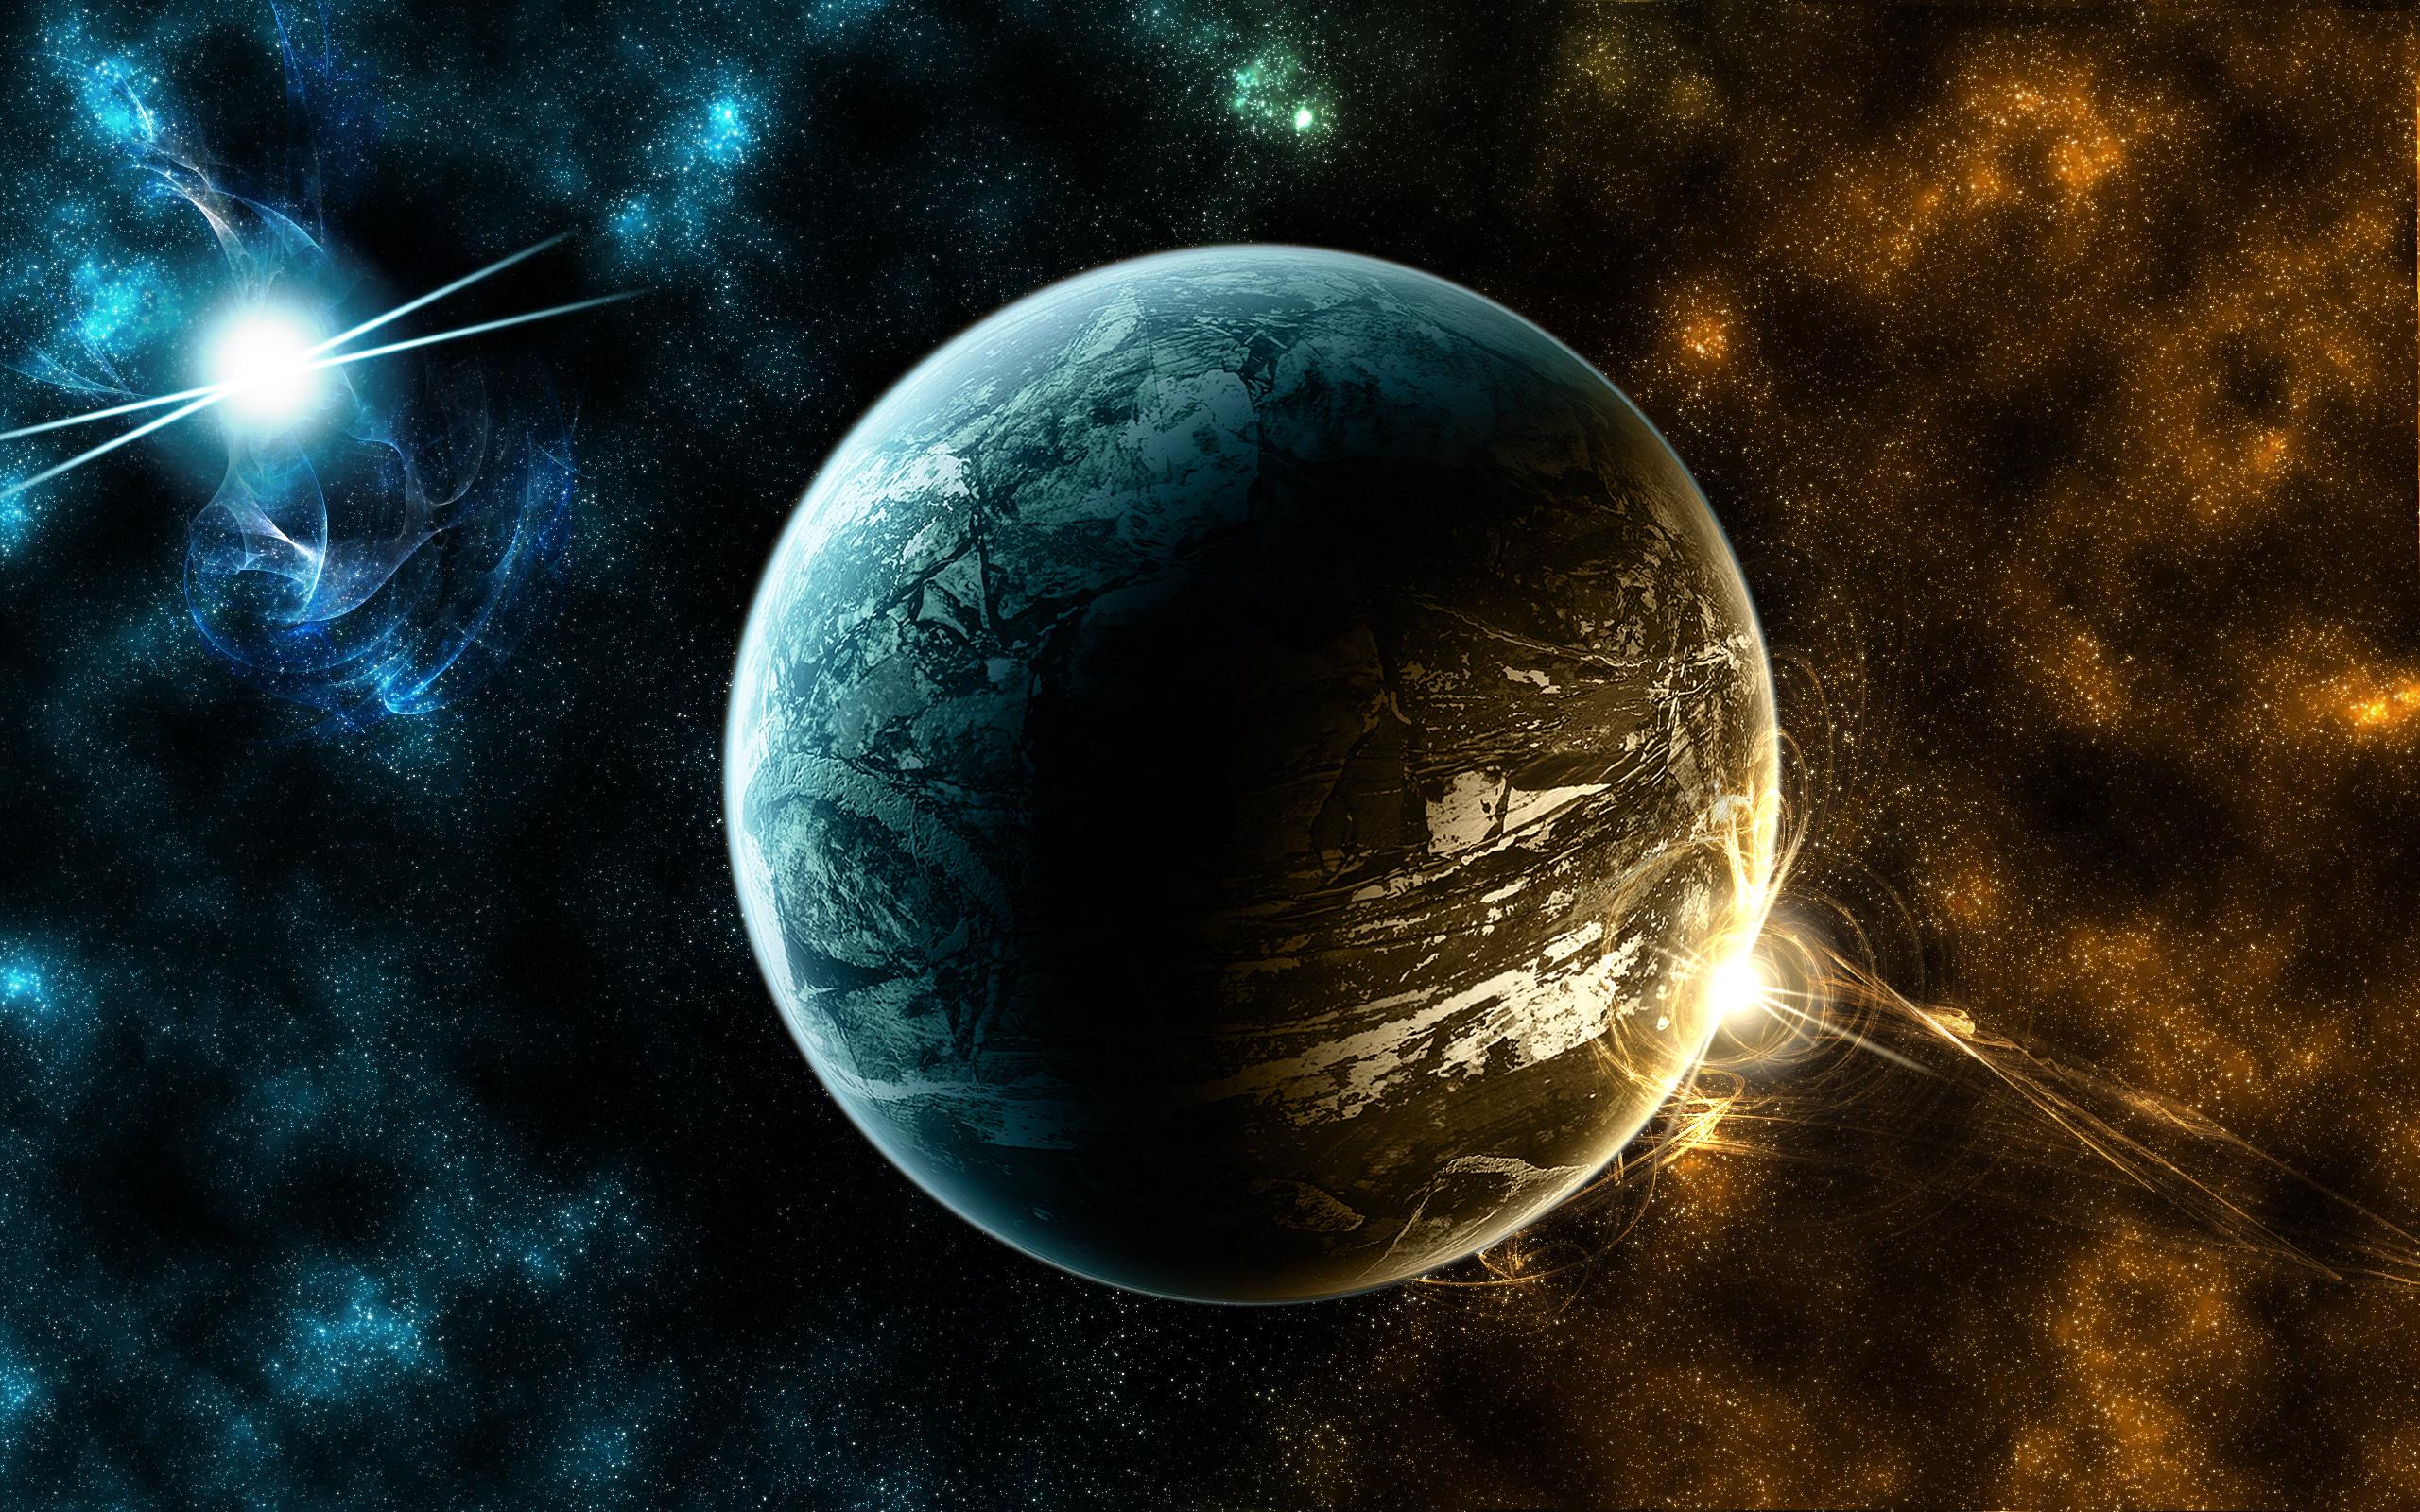 Hd wallpaper universe - Universe Backgrounds 13